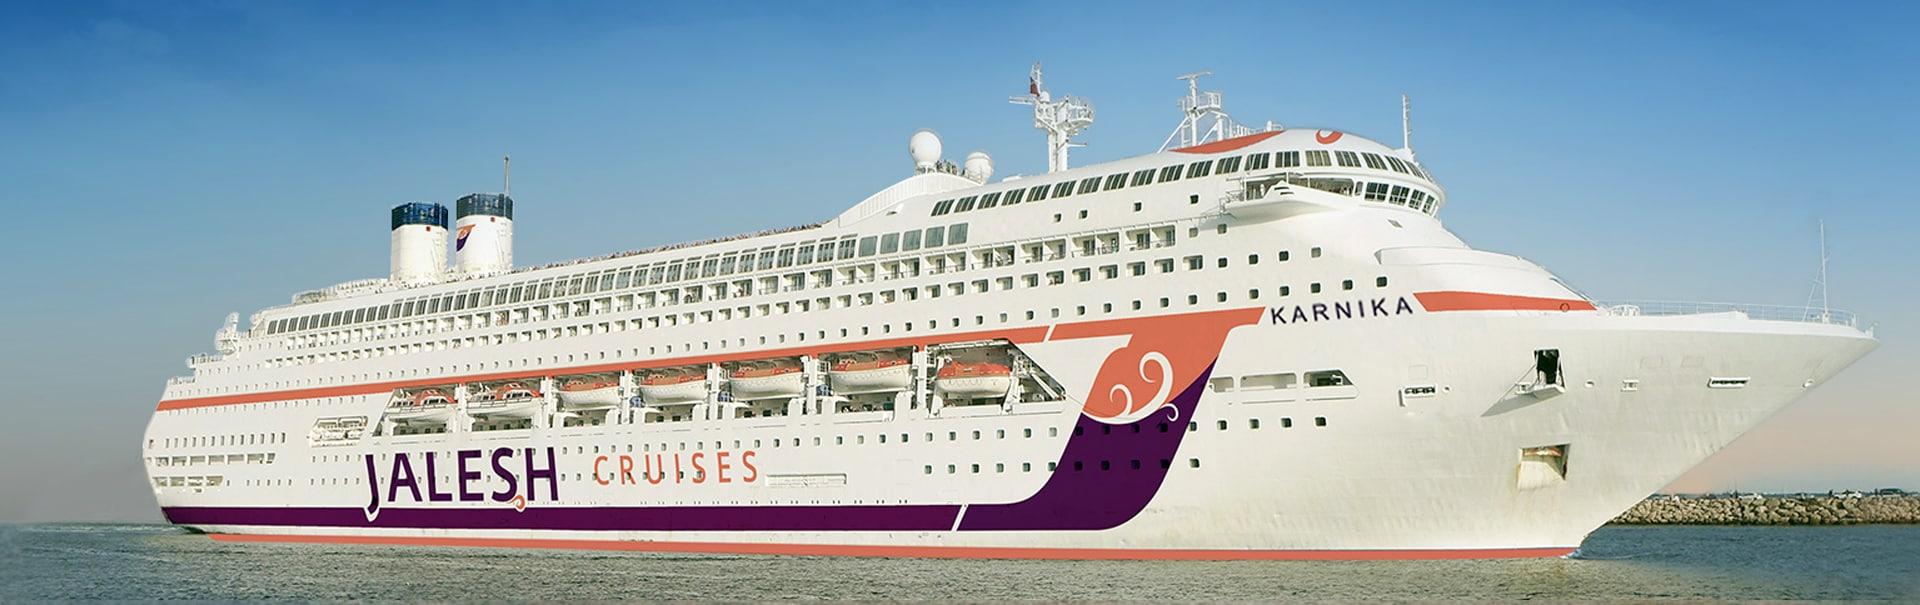 Seniors Special Jalesh Cruises (Karnika) (MHZJ) Banner